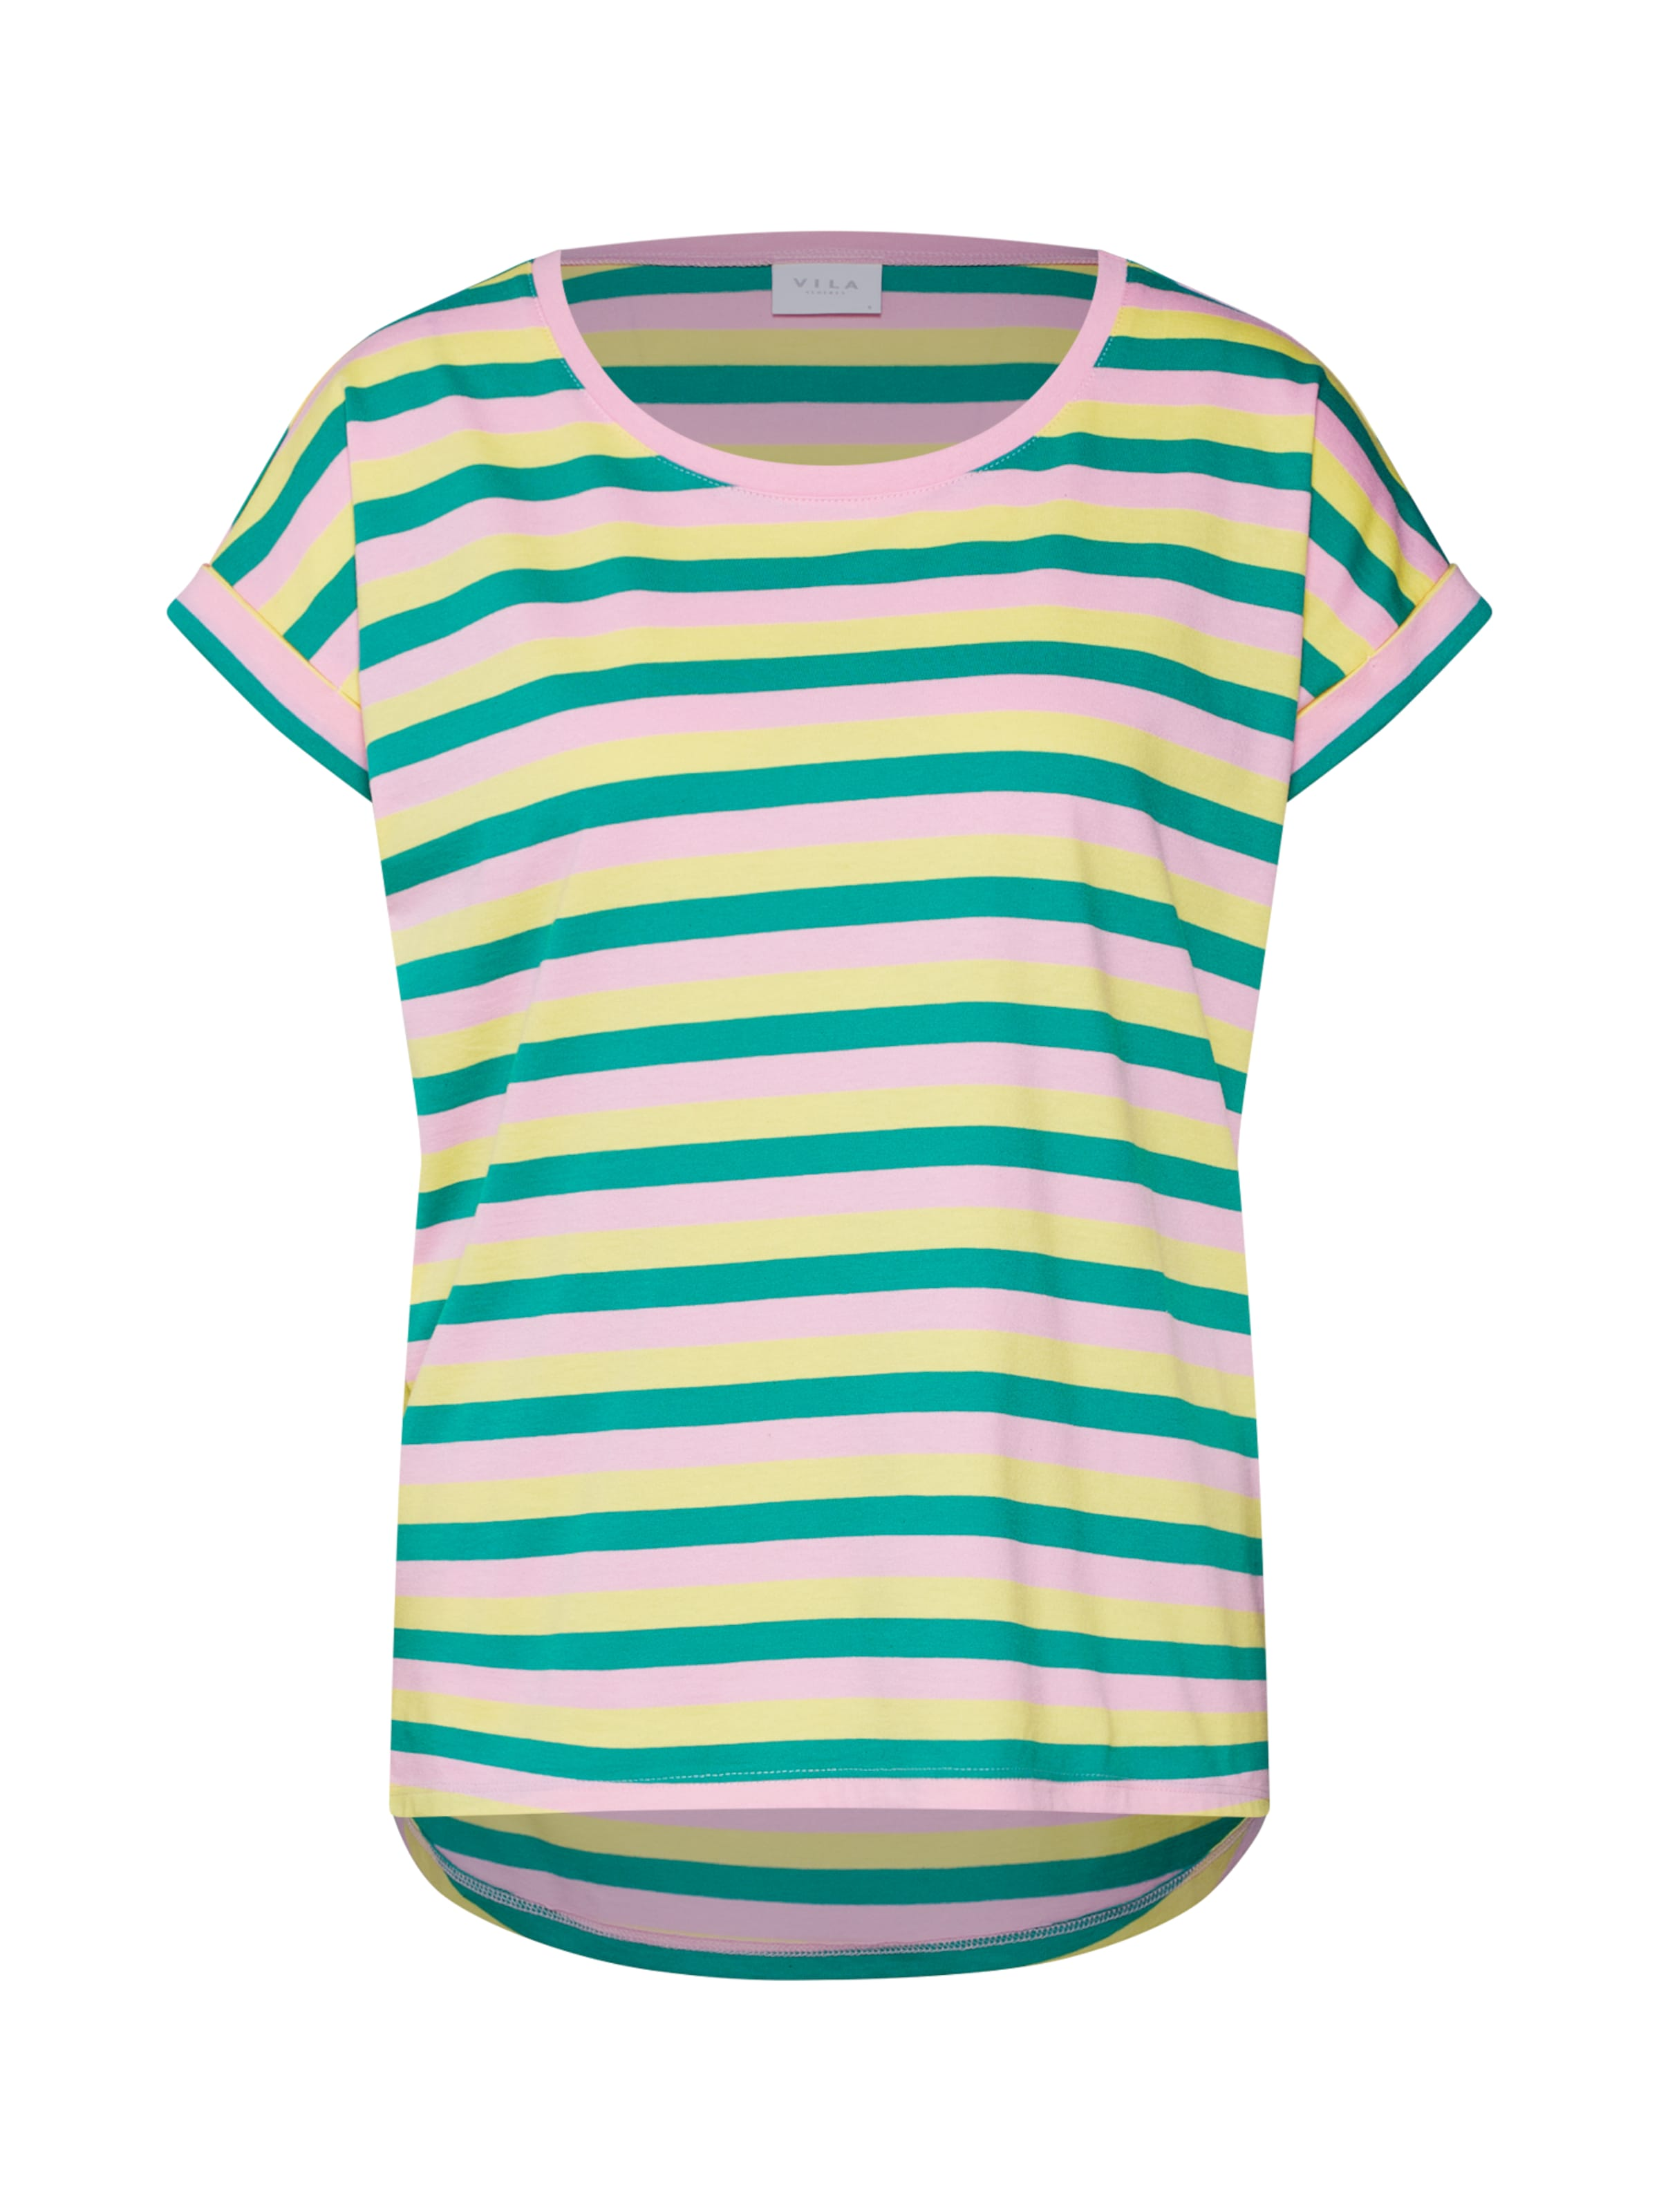 In Rosa Shirt BlauwGeel Vila 'dreamers' 3AjL4Rc5q